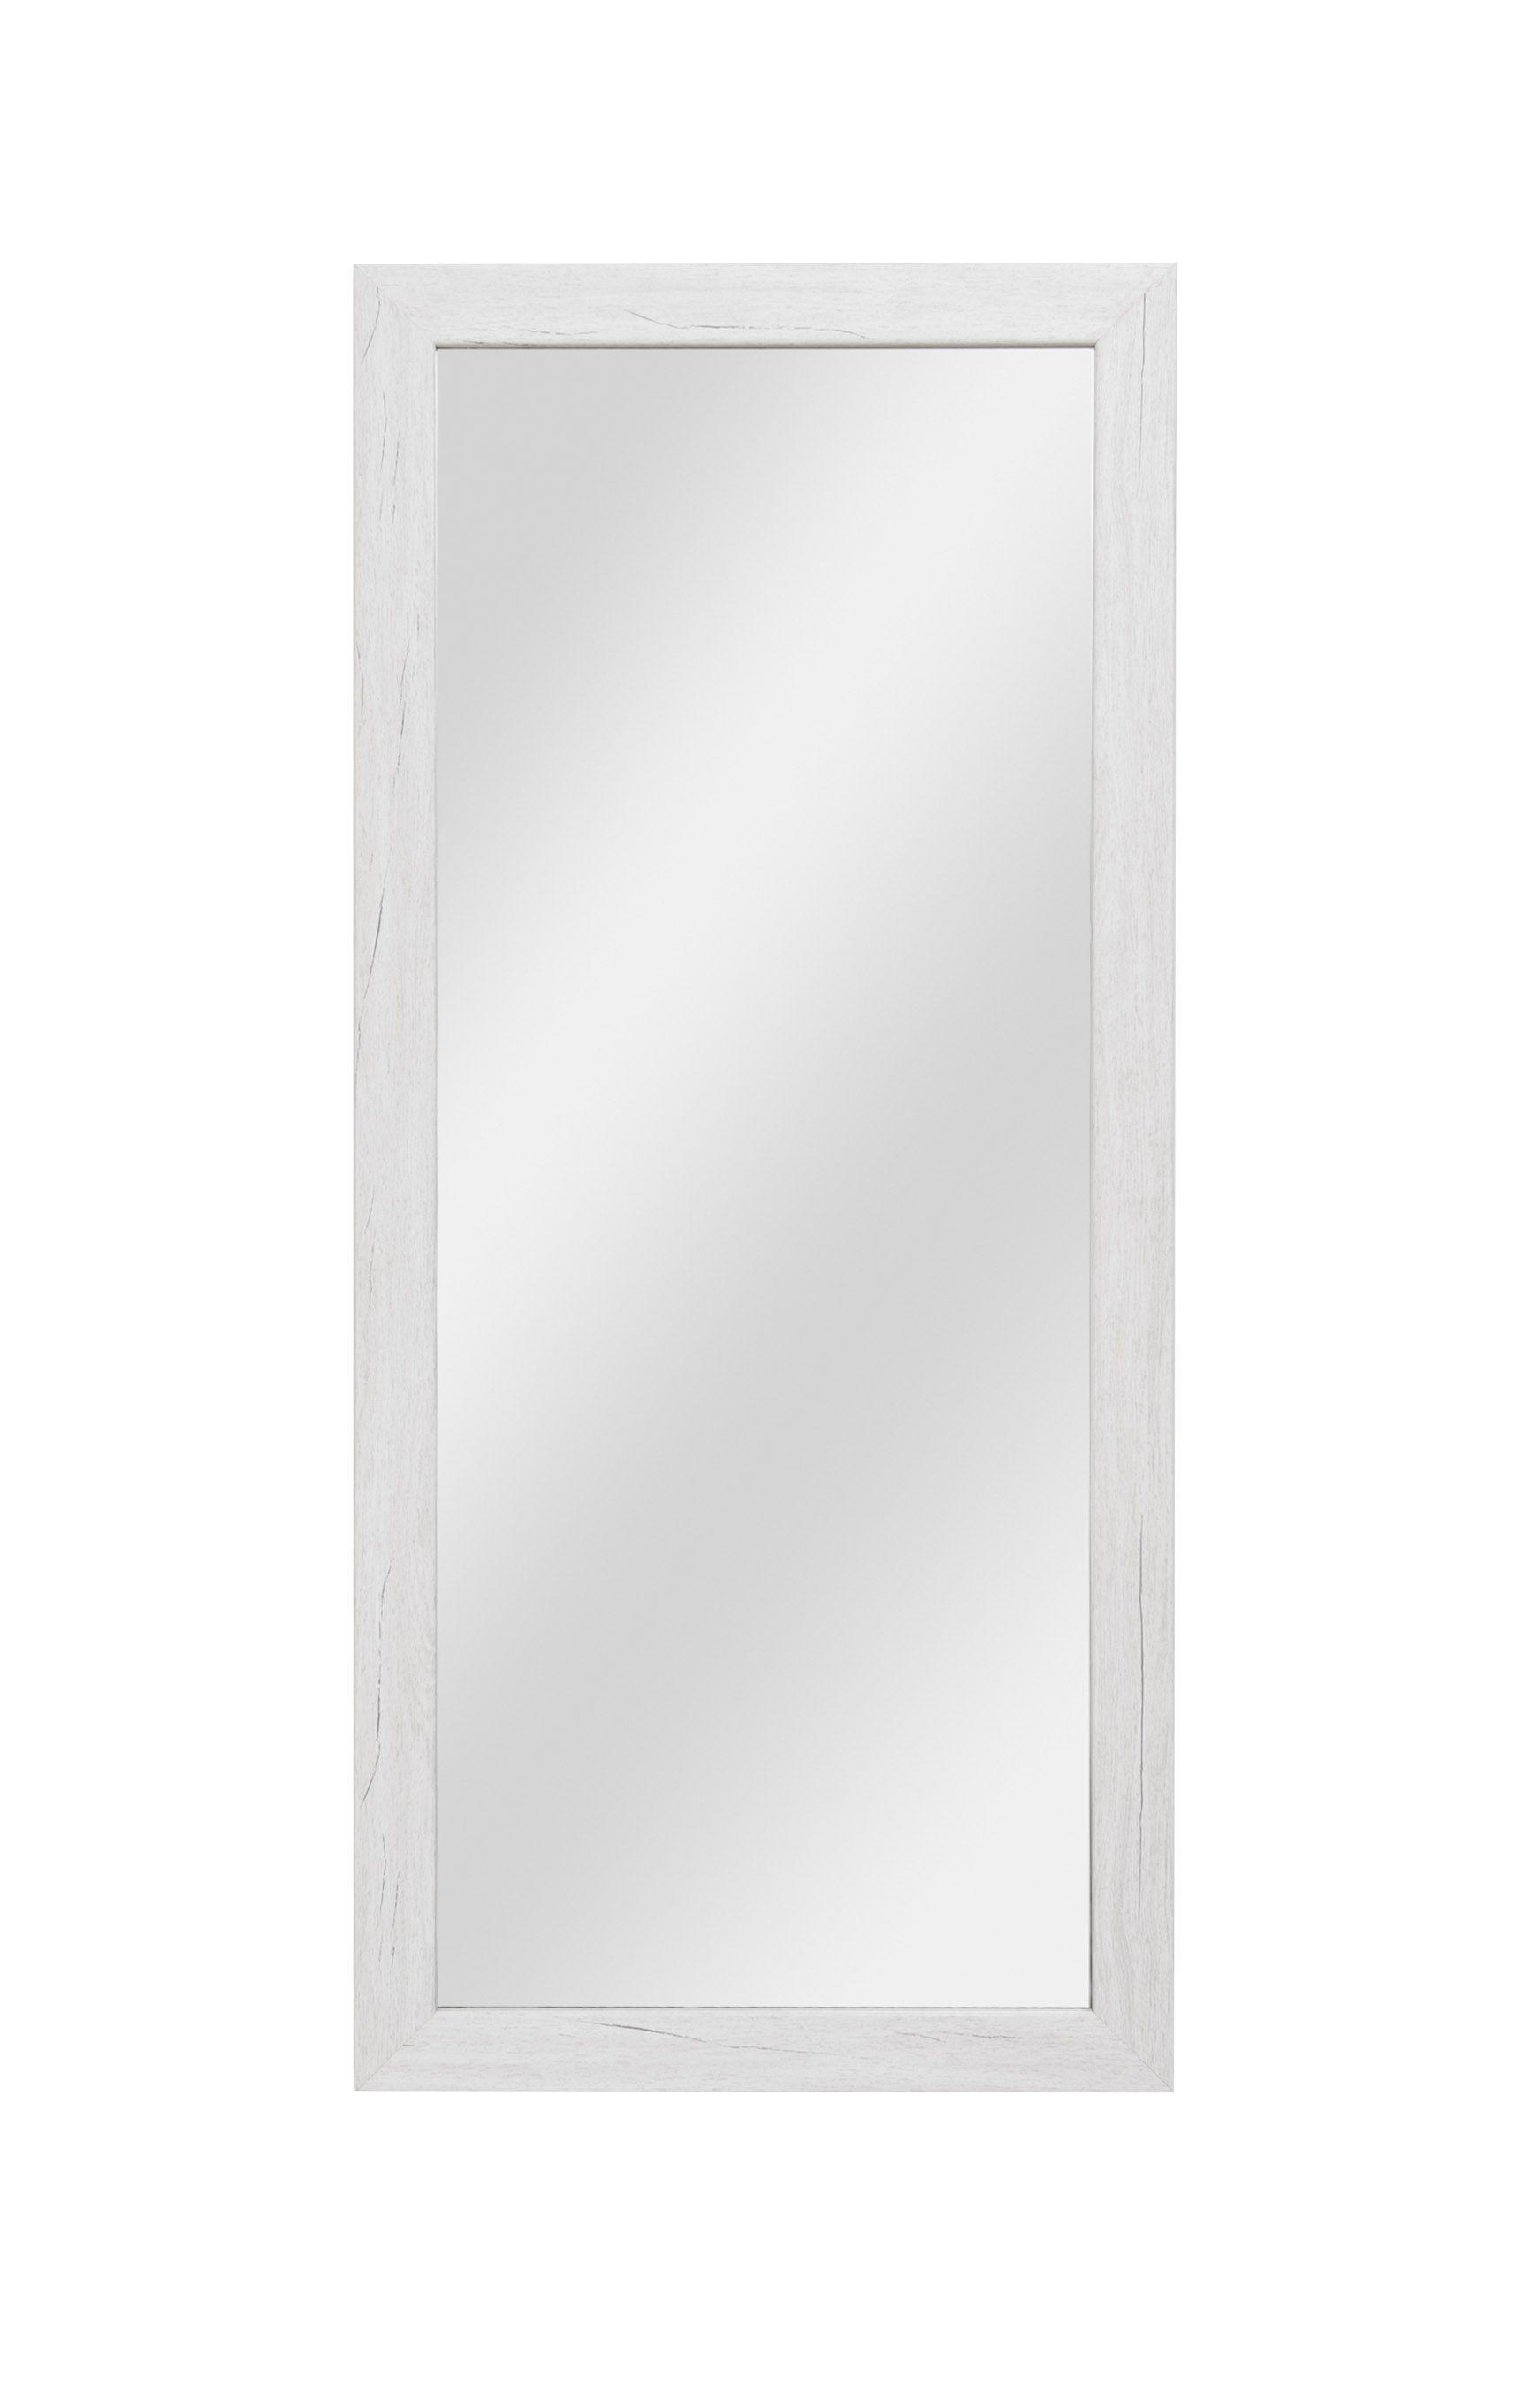 Spiegel Camprodon 04, Farbe: Eiche Weiß - 113 x 50 x 2 cm (H x B x T)